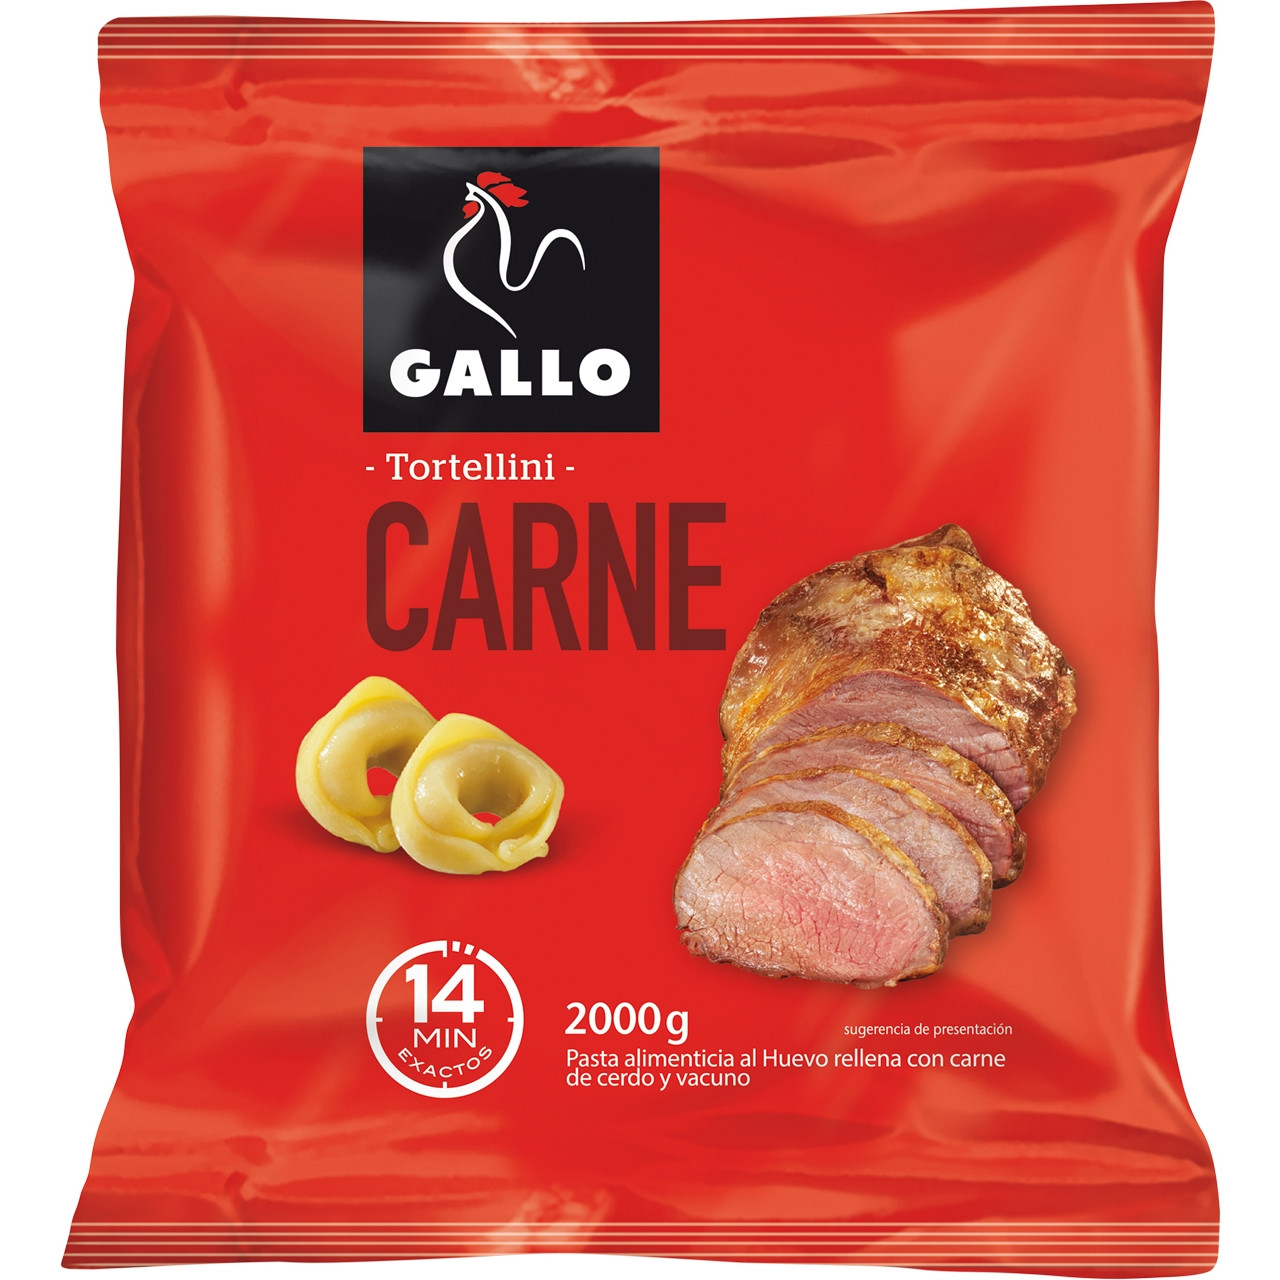 Tortel.lini farcits de carn Gallo